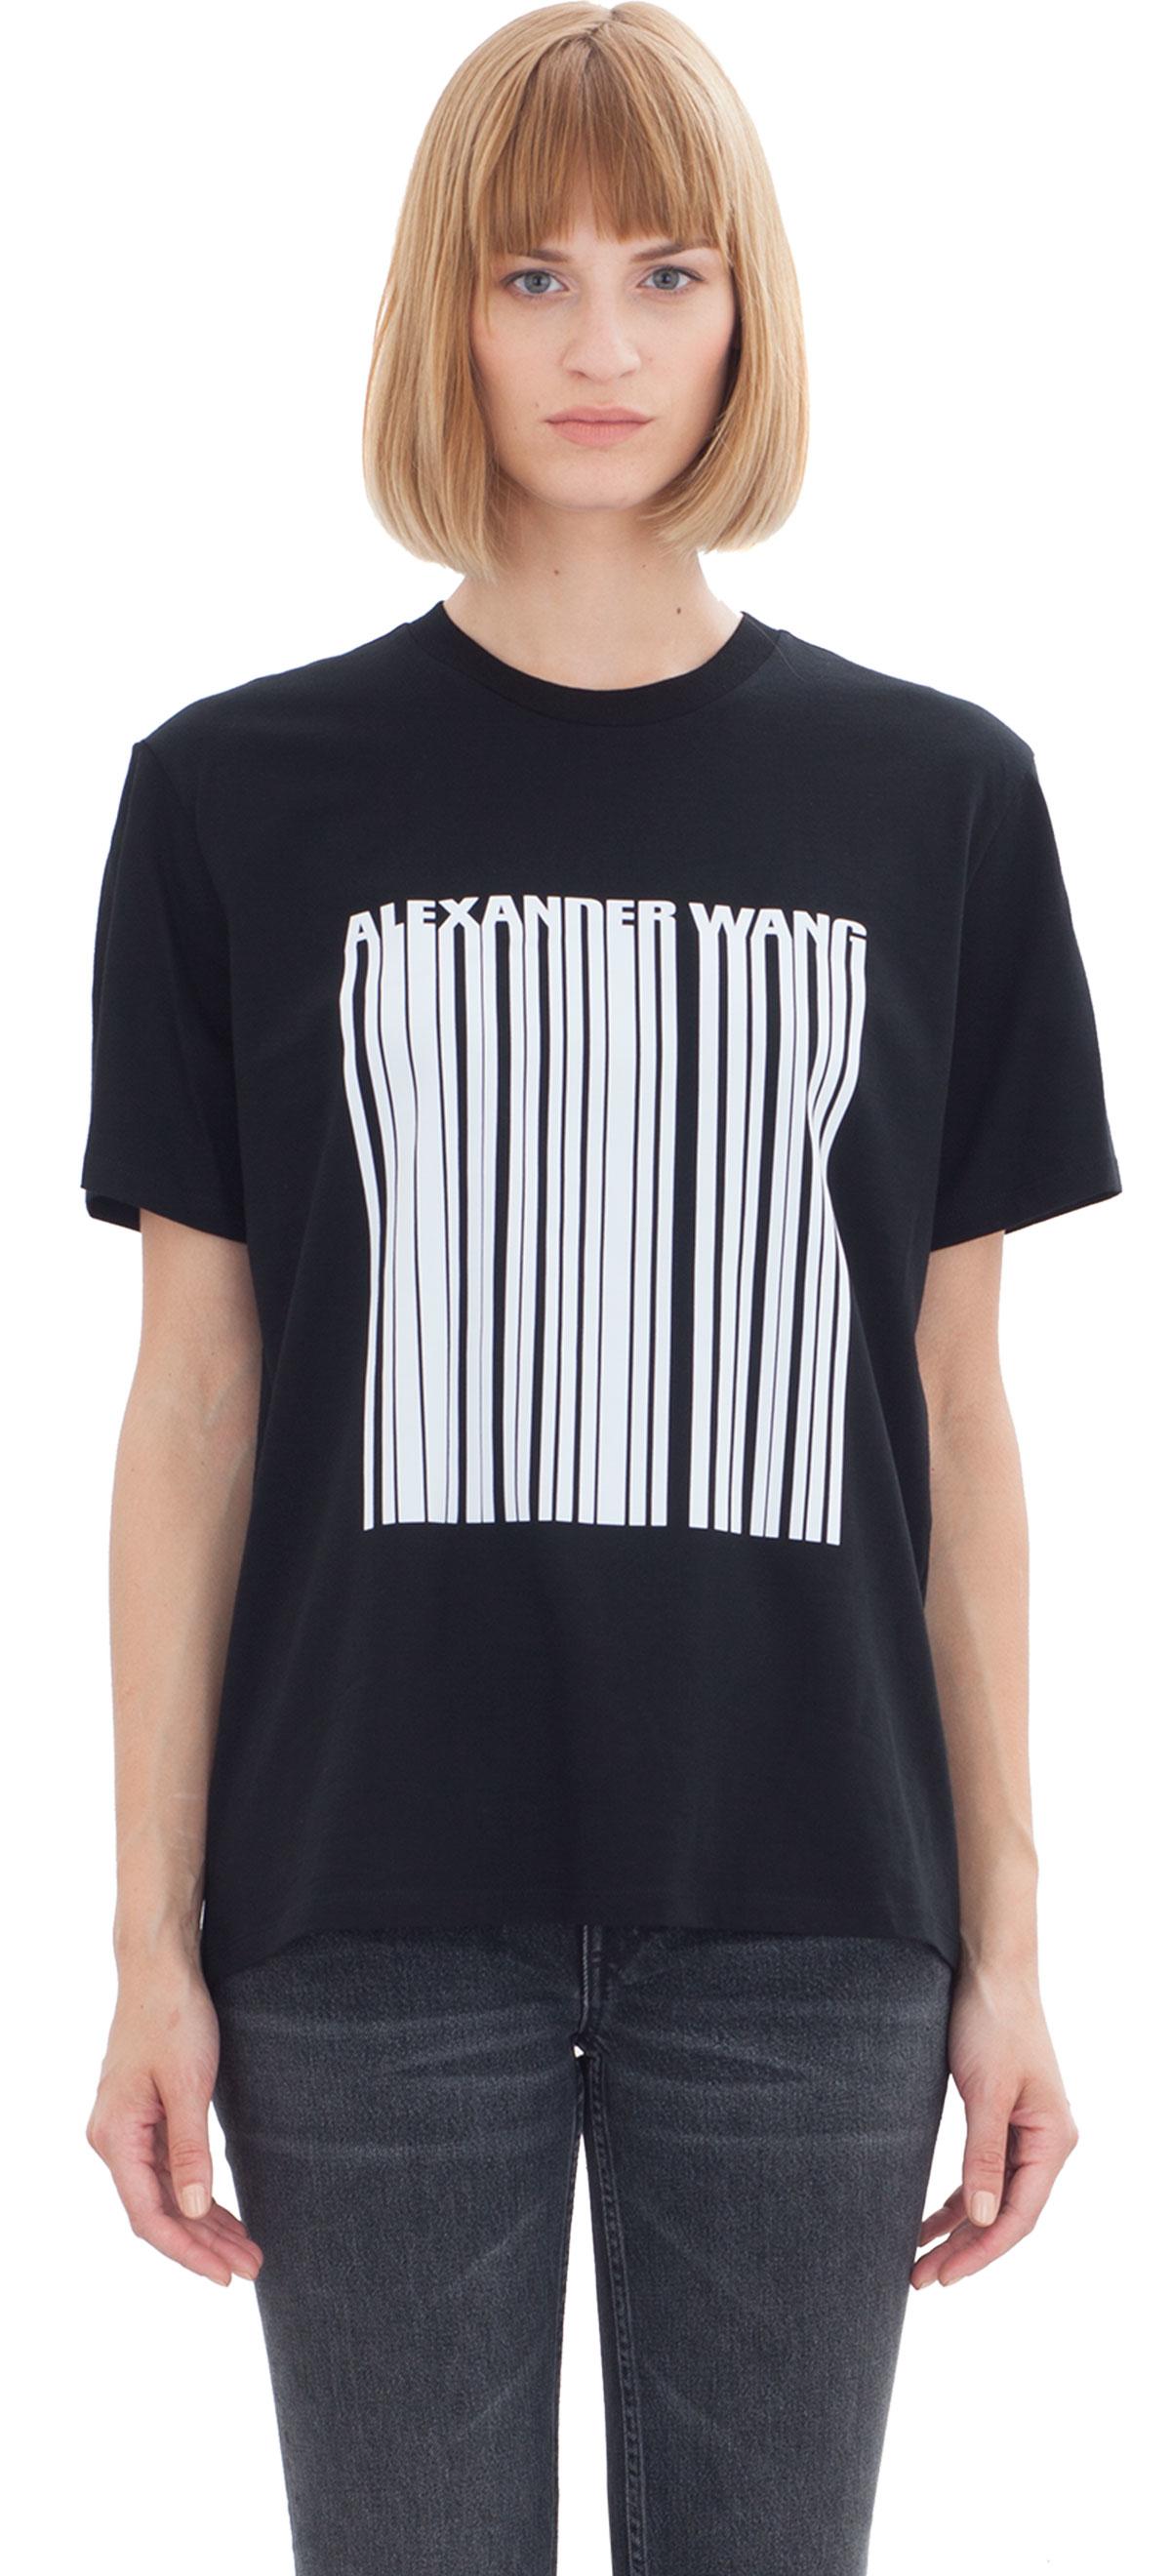 Alexander Wang Printed Cotton T Shirt In Black Lyst